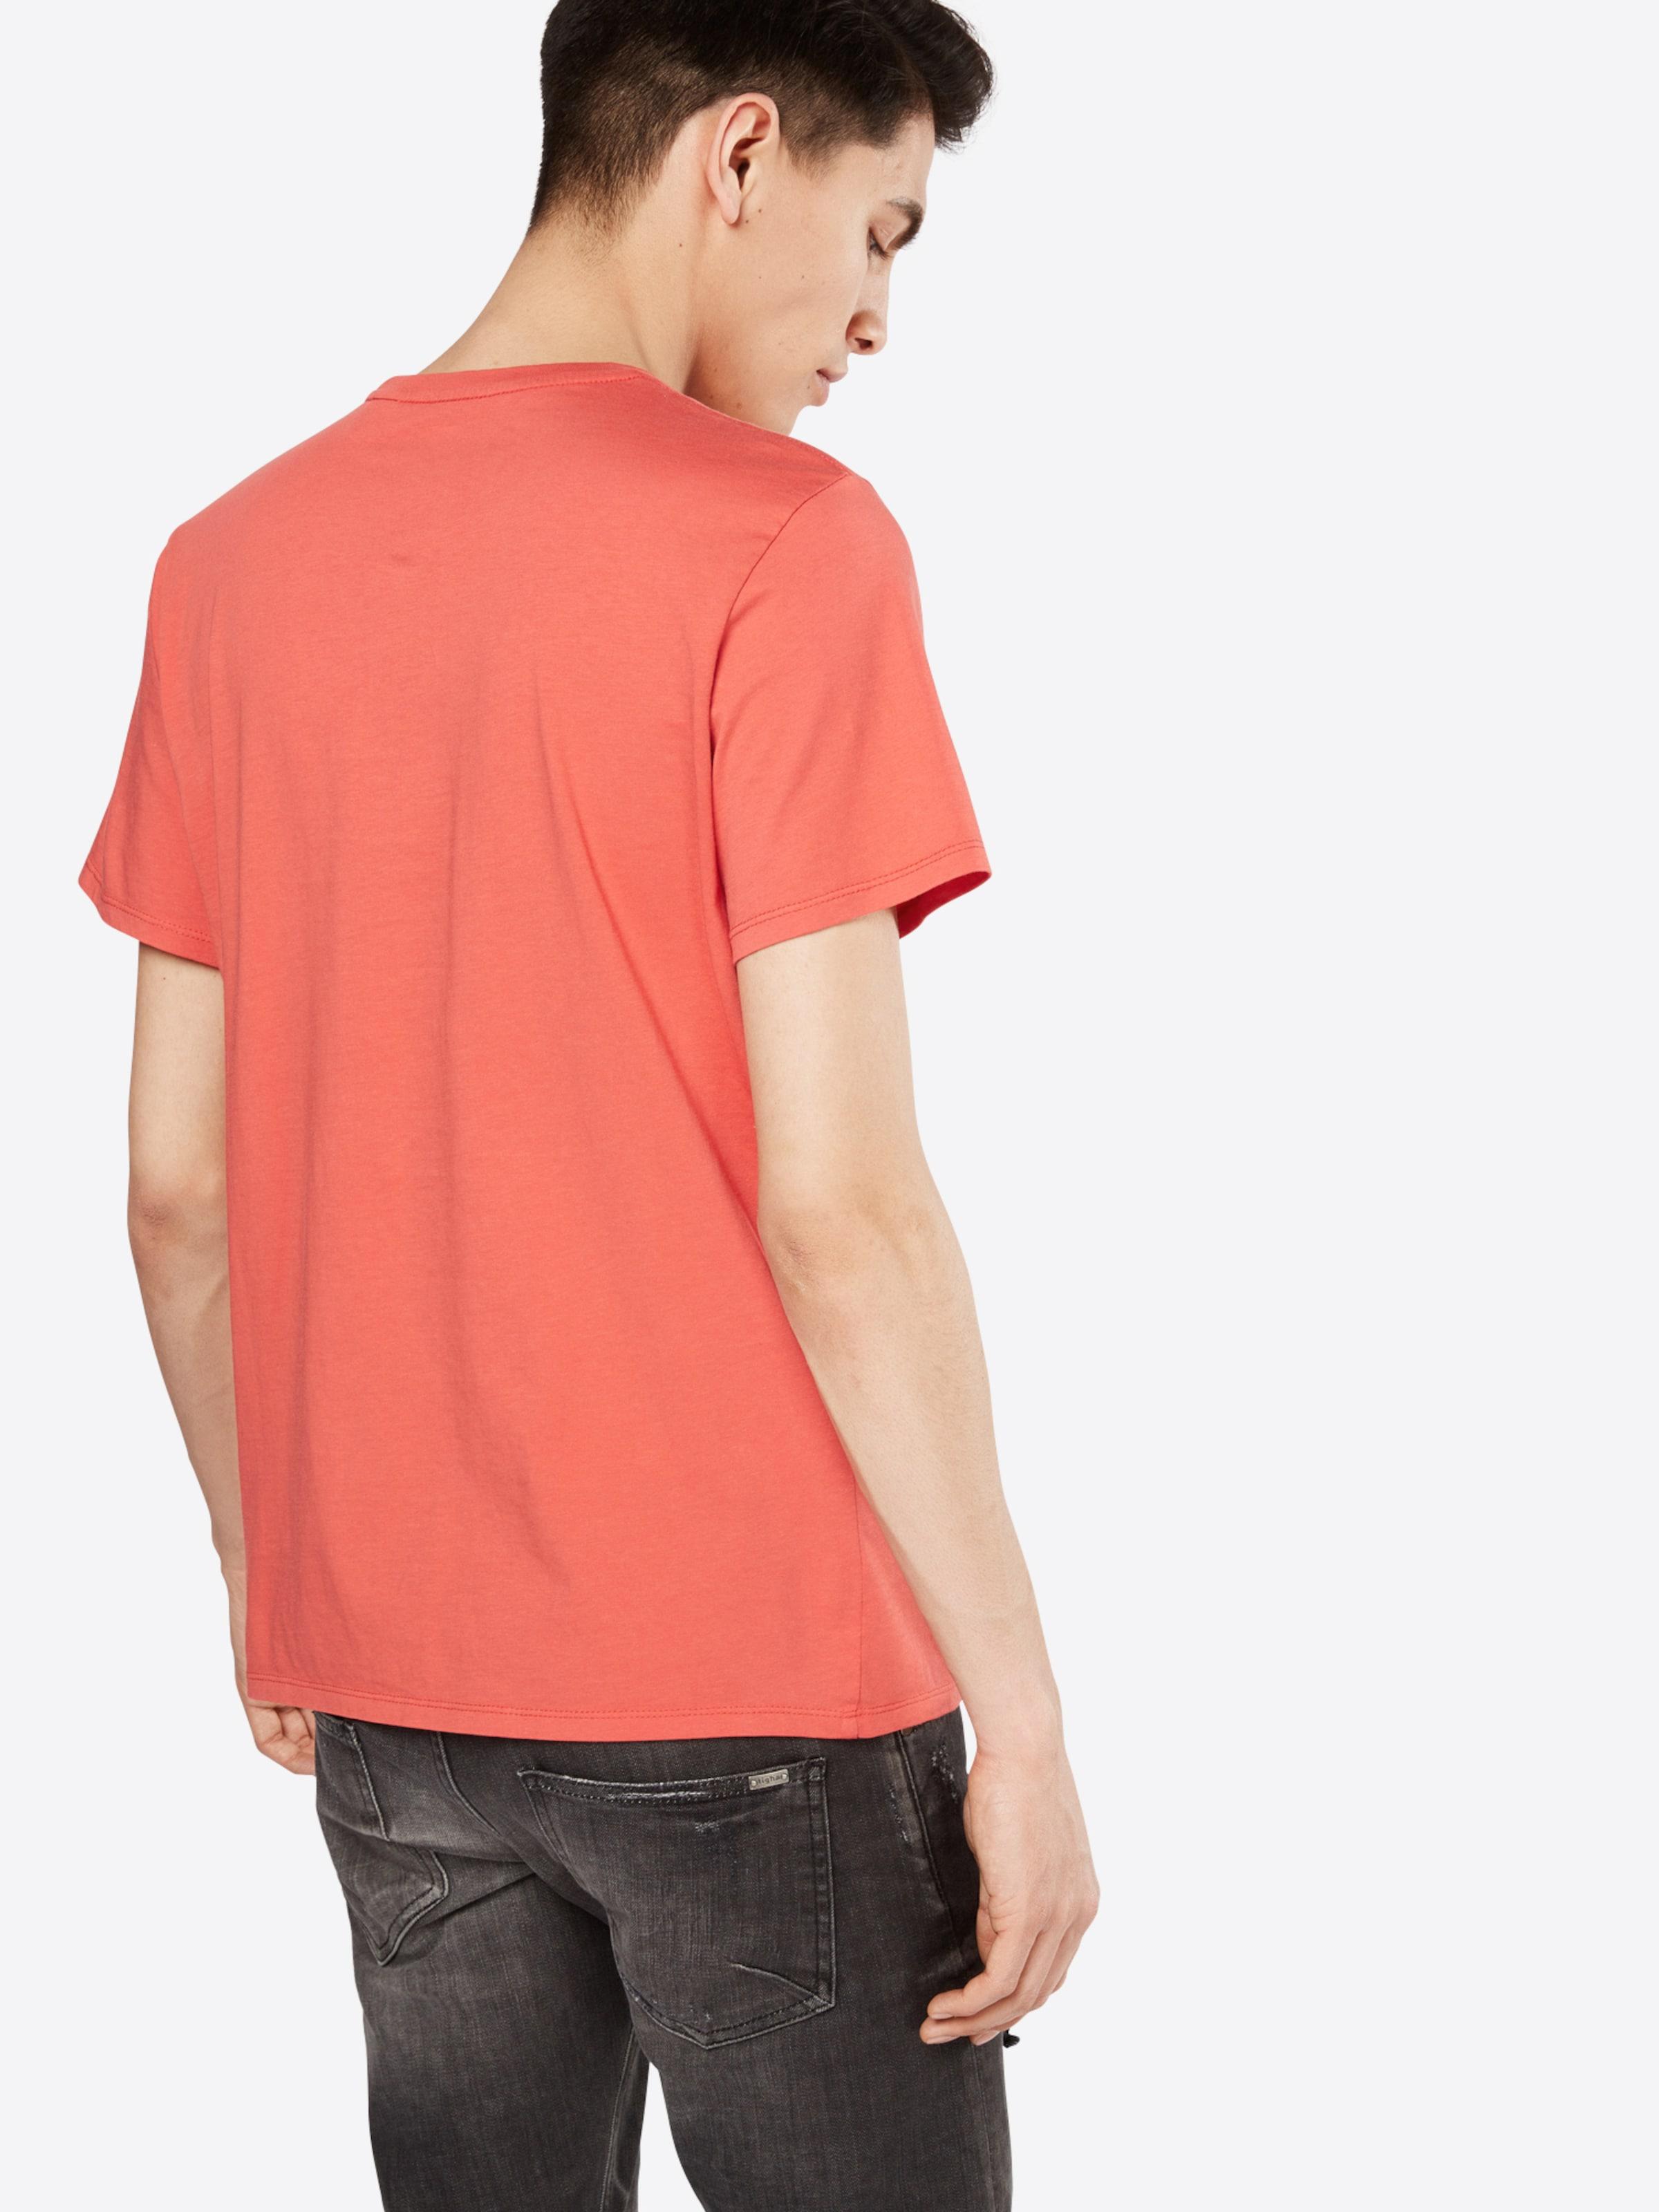 LEVI'S T-Shirt 'GRAPHIC SET-IN NECK 2' Steckdose Reihenfolge UzZDUhb